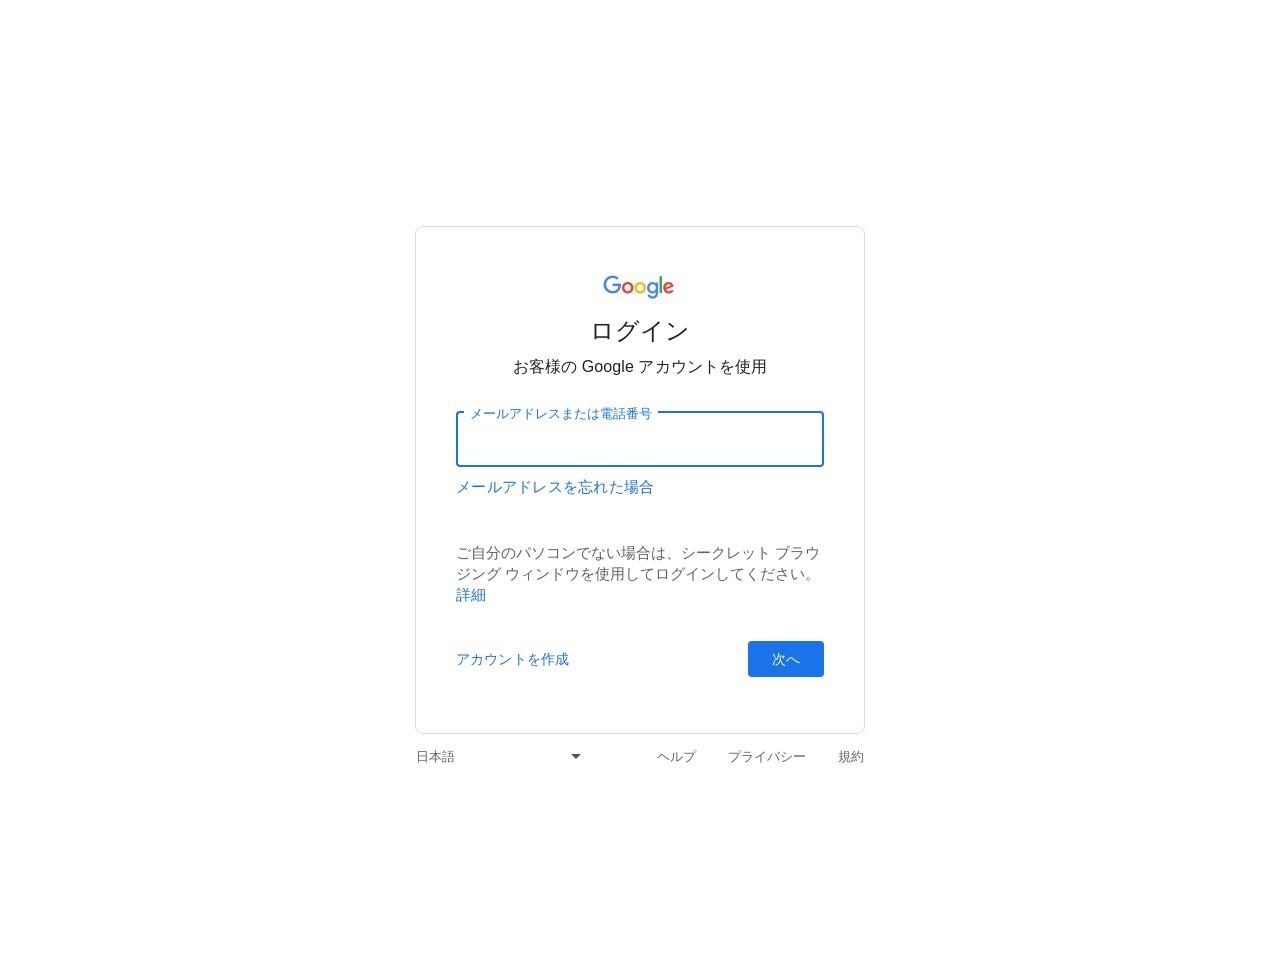 about?w=image Bradley Wicklund, Screen Google